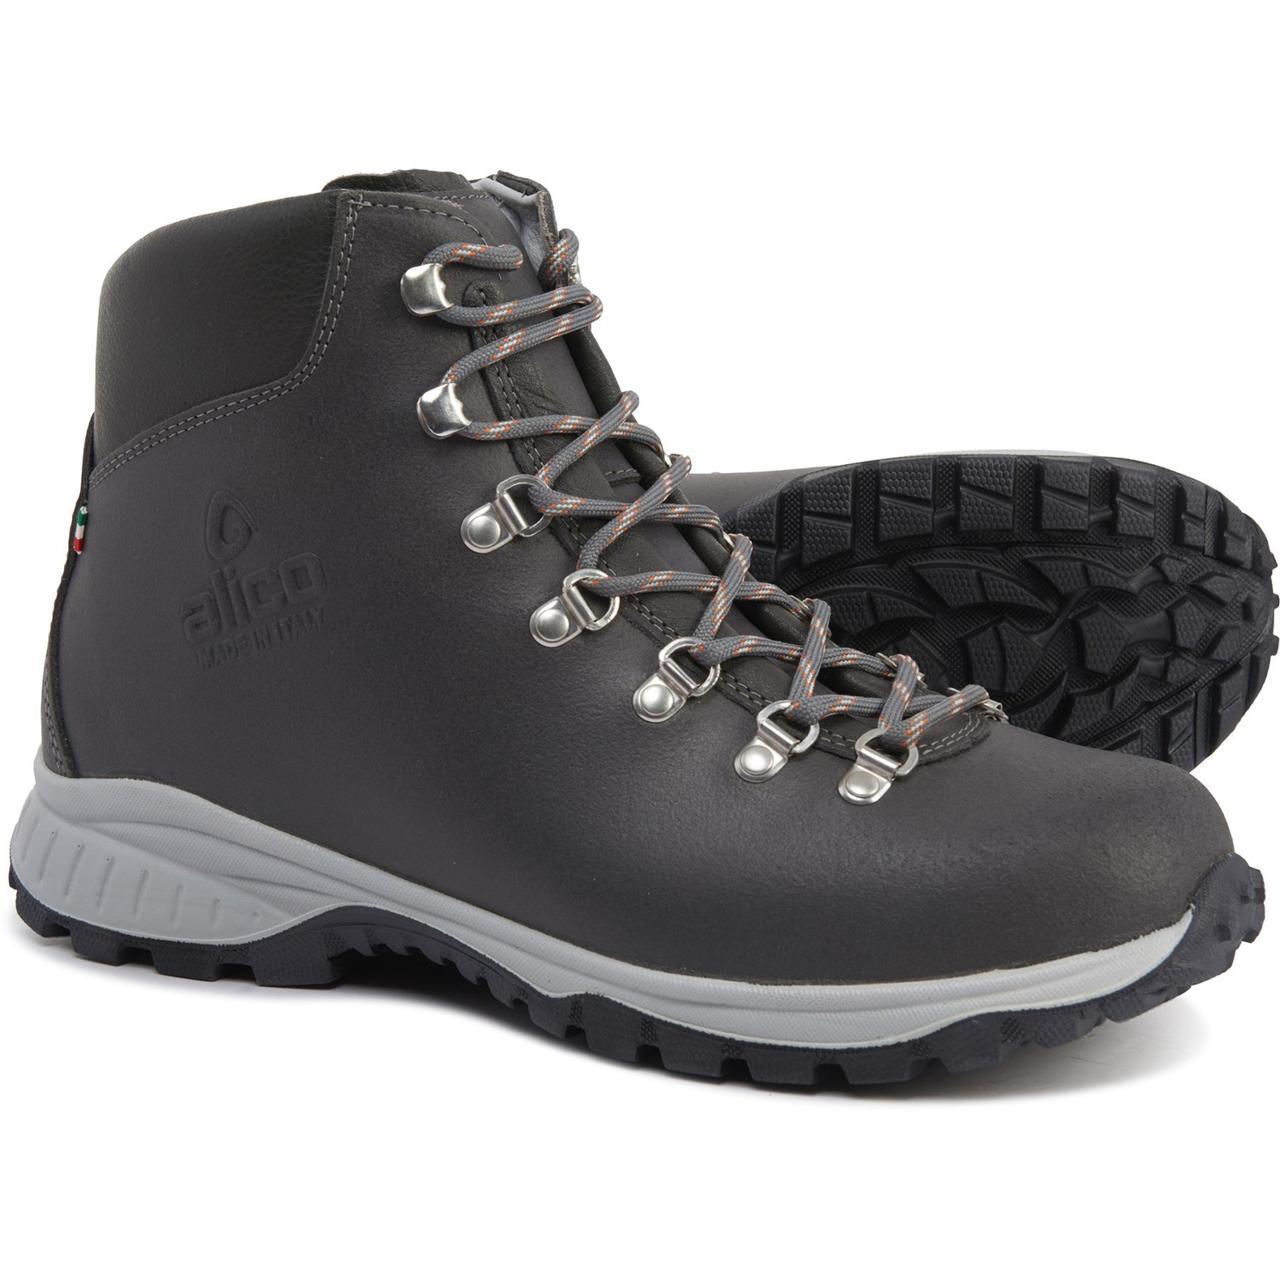 Ботинки трекинговые Alico Sherpa (Код ASHPG-46)